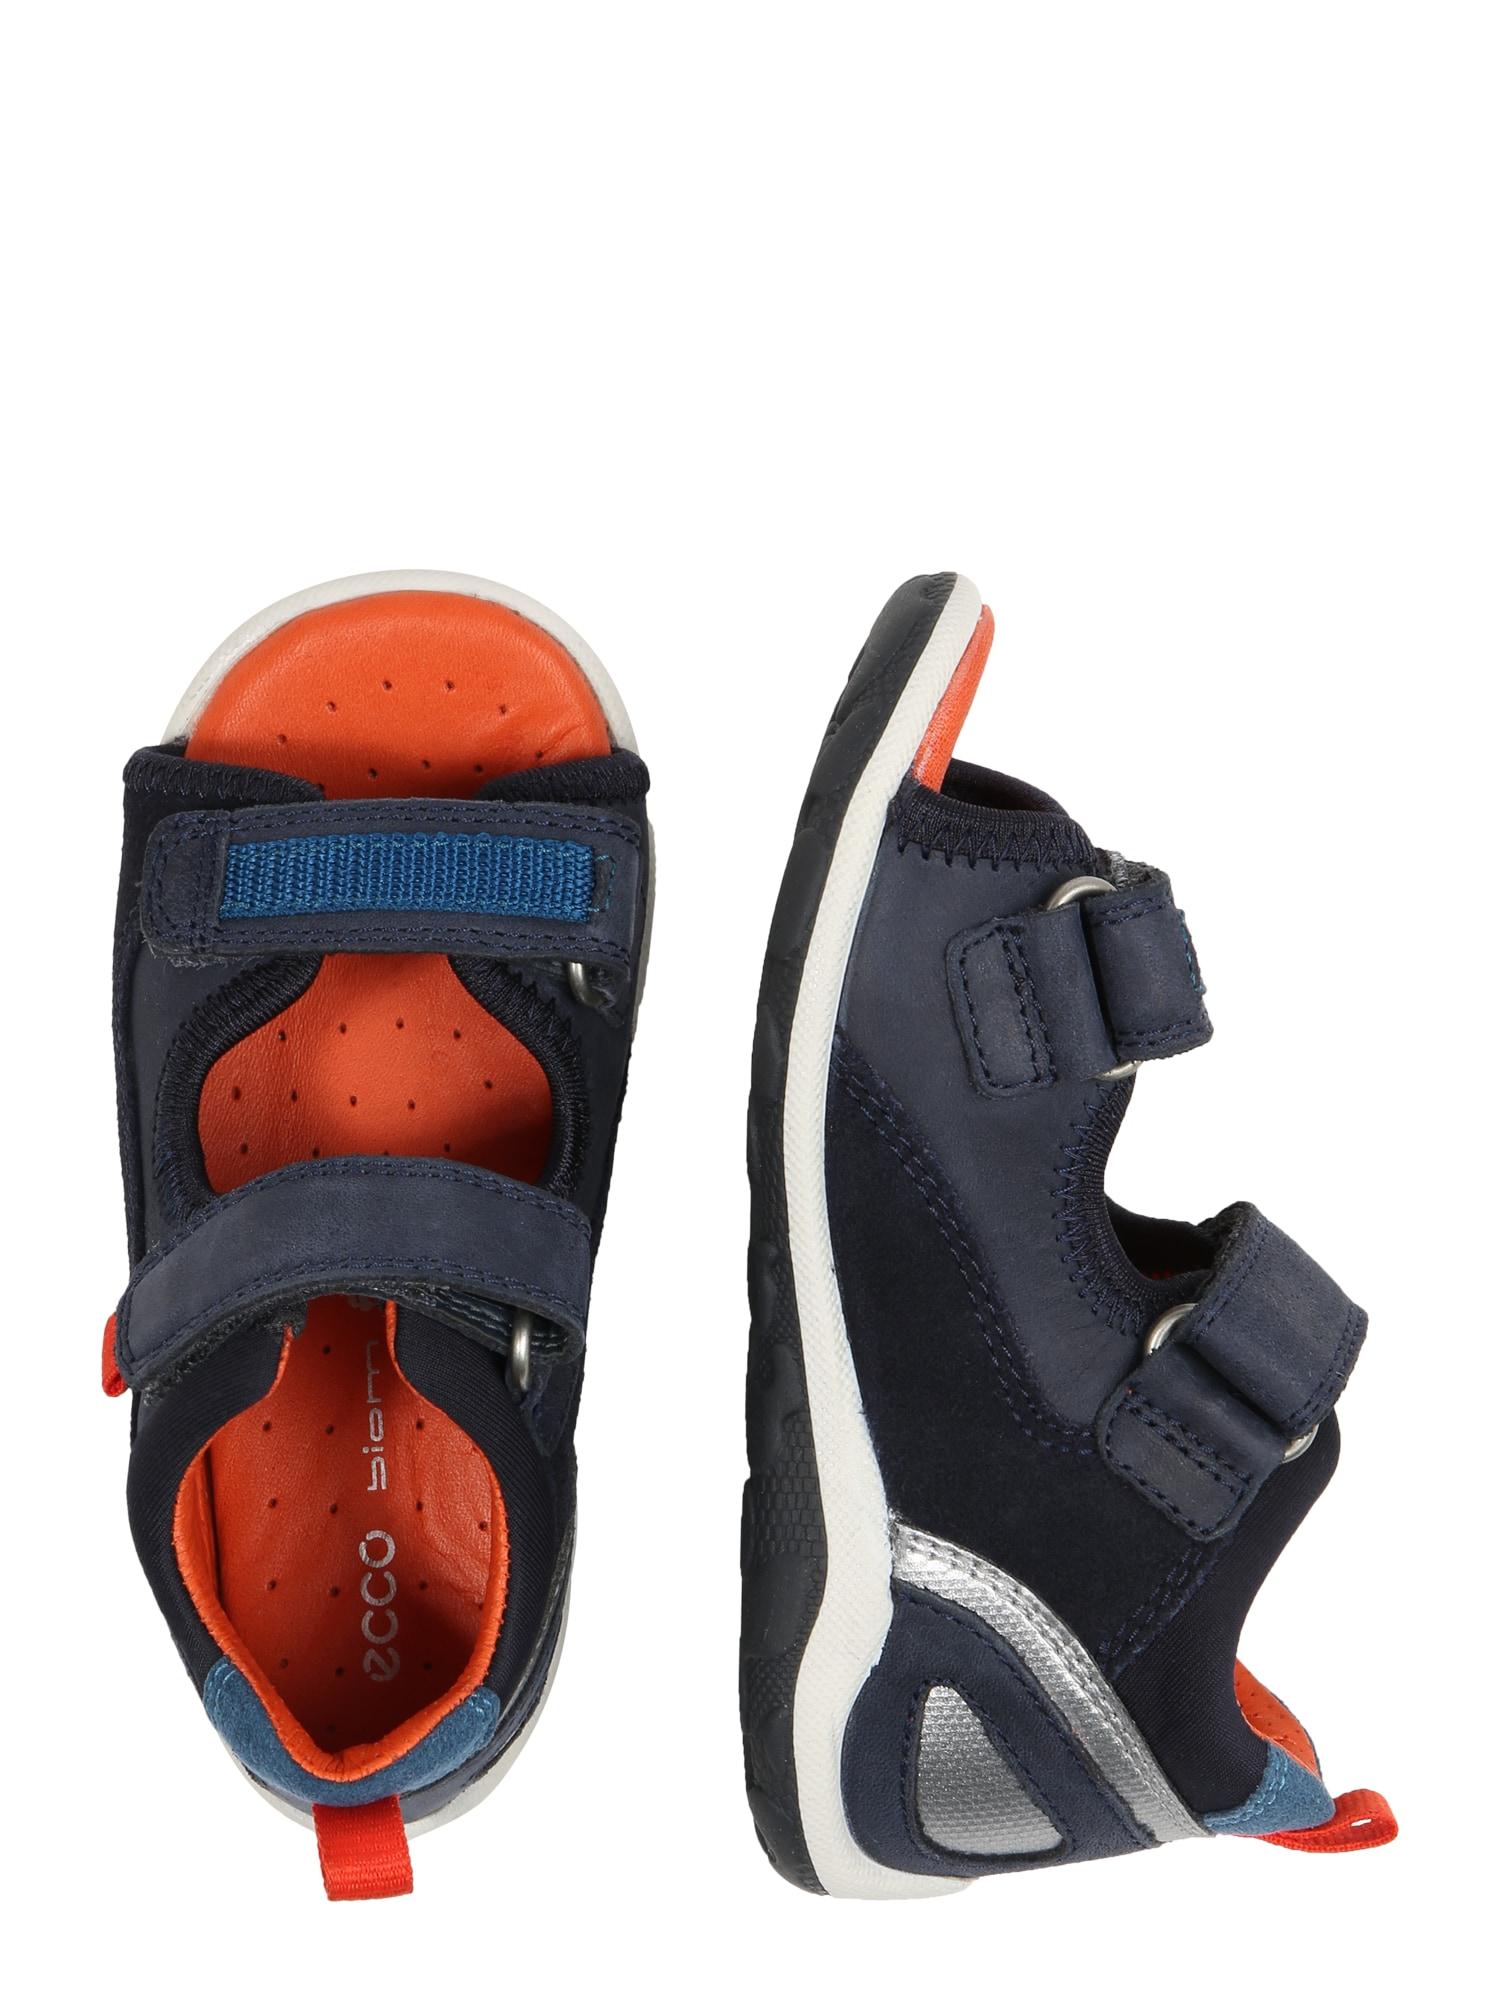 sports shoes 49daa 09889 AboutYou | SALE Kinder,Mädchen ECCO ECCO Sandale Biom Mini ...